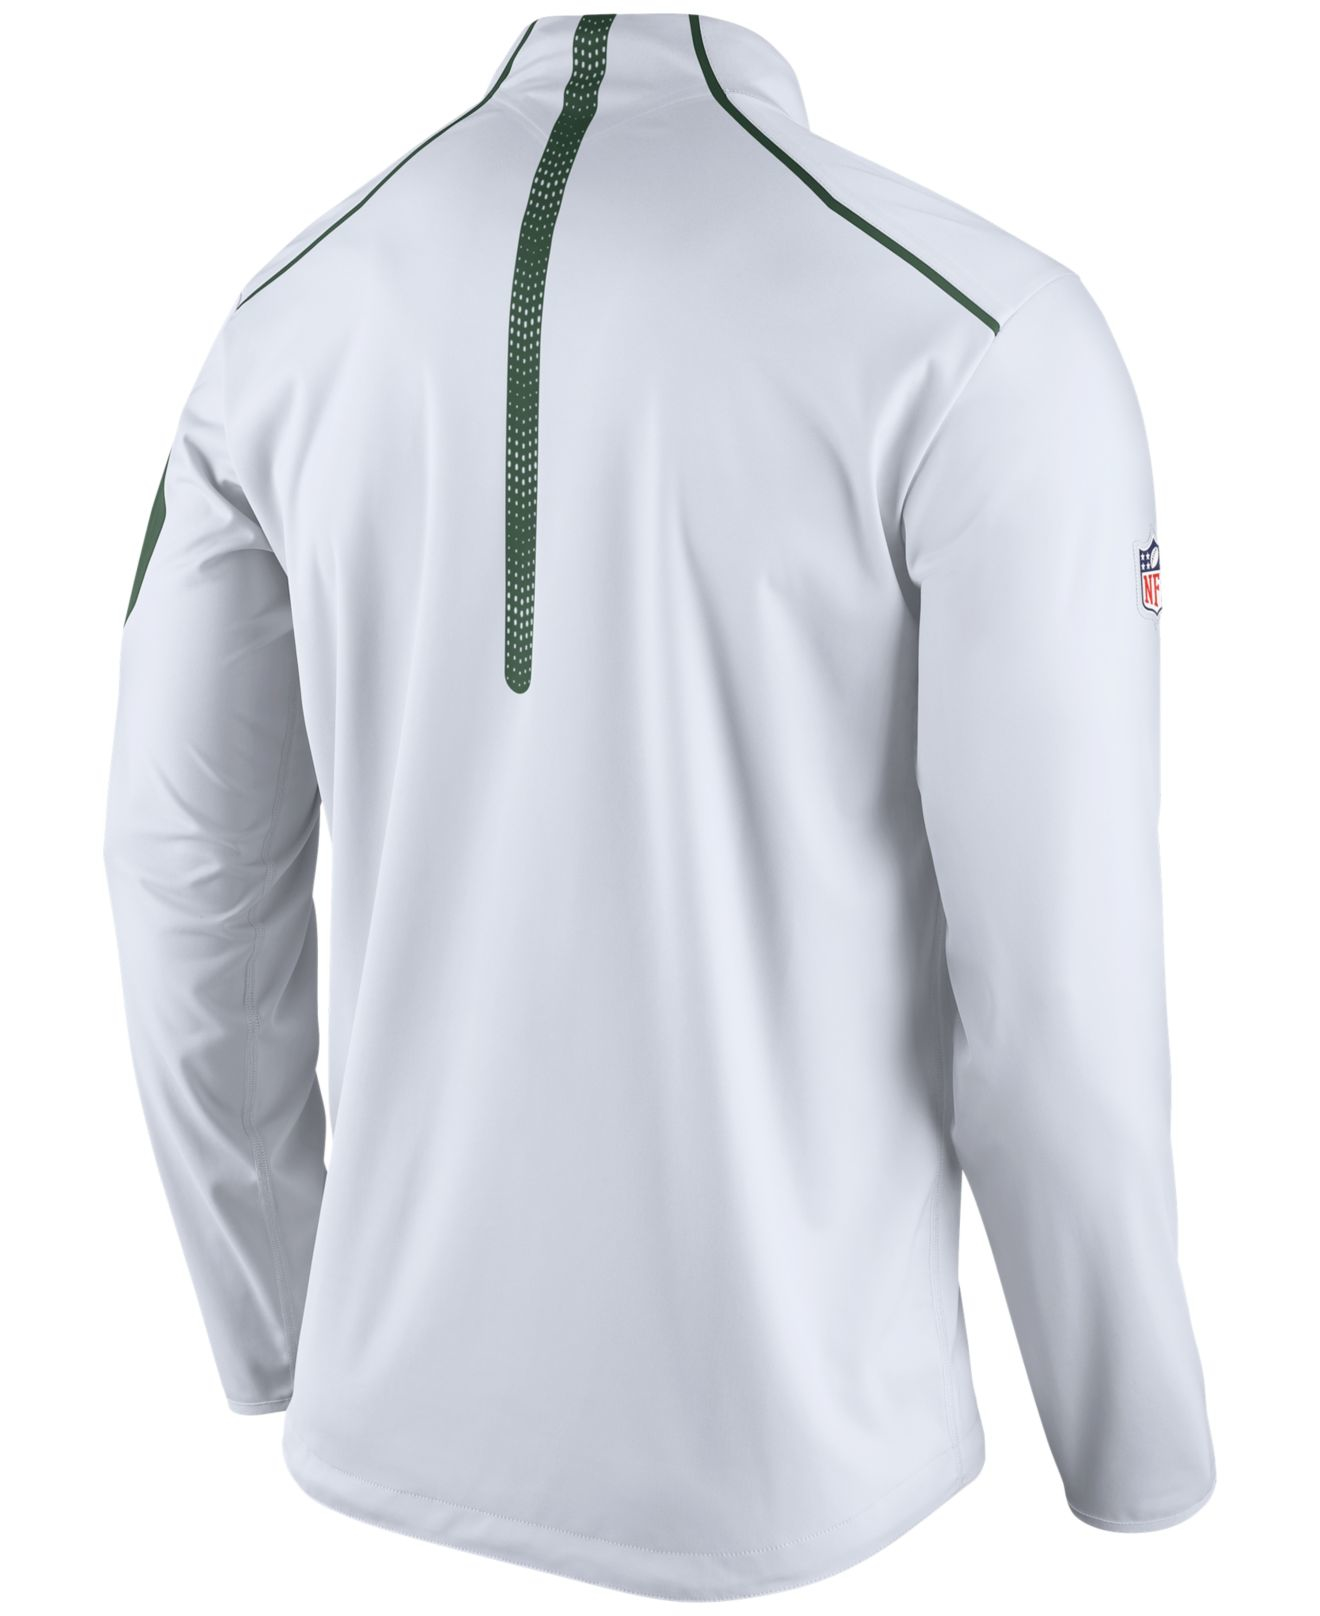 7fe41dfec5d1 Lyst - Nike Men s New York Jets Alpha Fly Rush Quarter-zip Jacket in ...